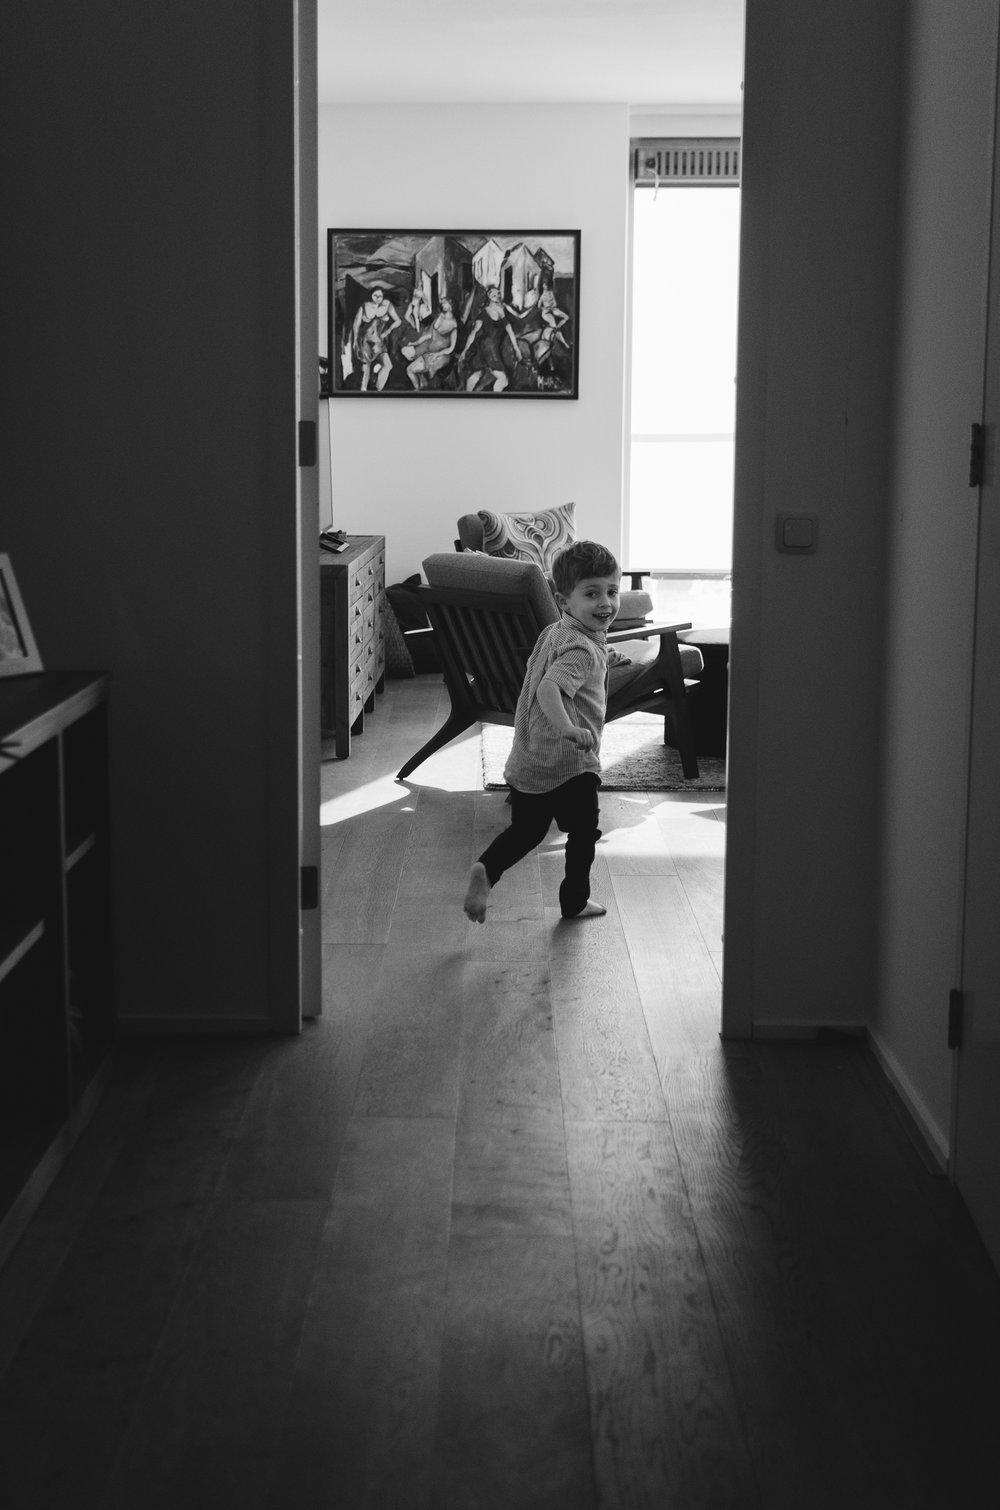 Vicky_McLachlan_Photography_Family_Newborn_Lifestyle_Photographer-1-5-2.jpg